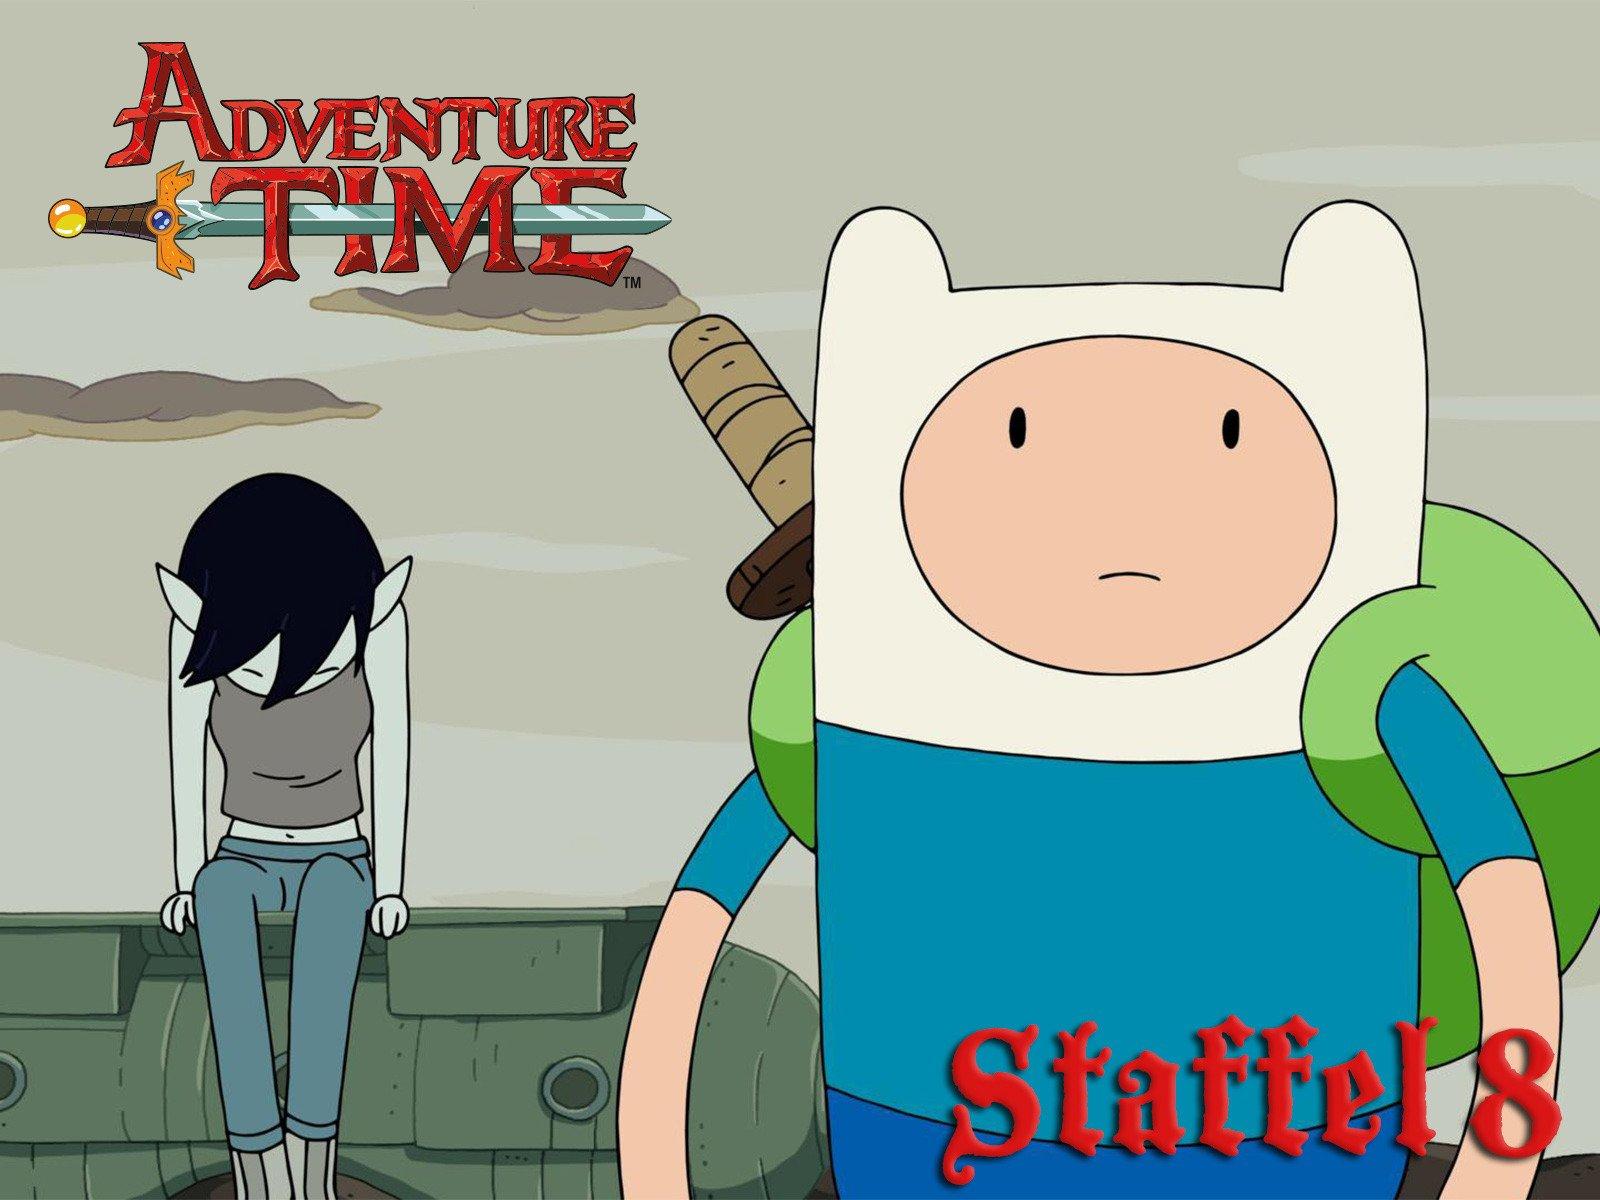 Amazon.de: Adventure Time - Staffel 8 ansehen | Prime Video